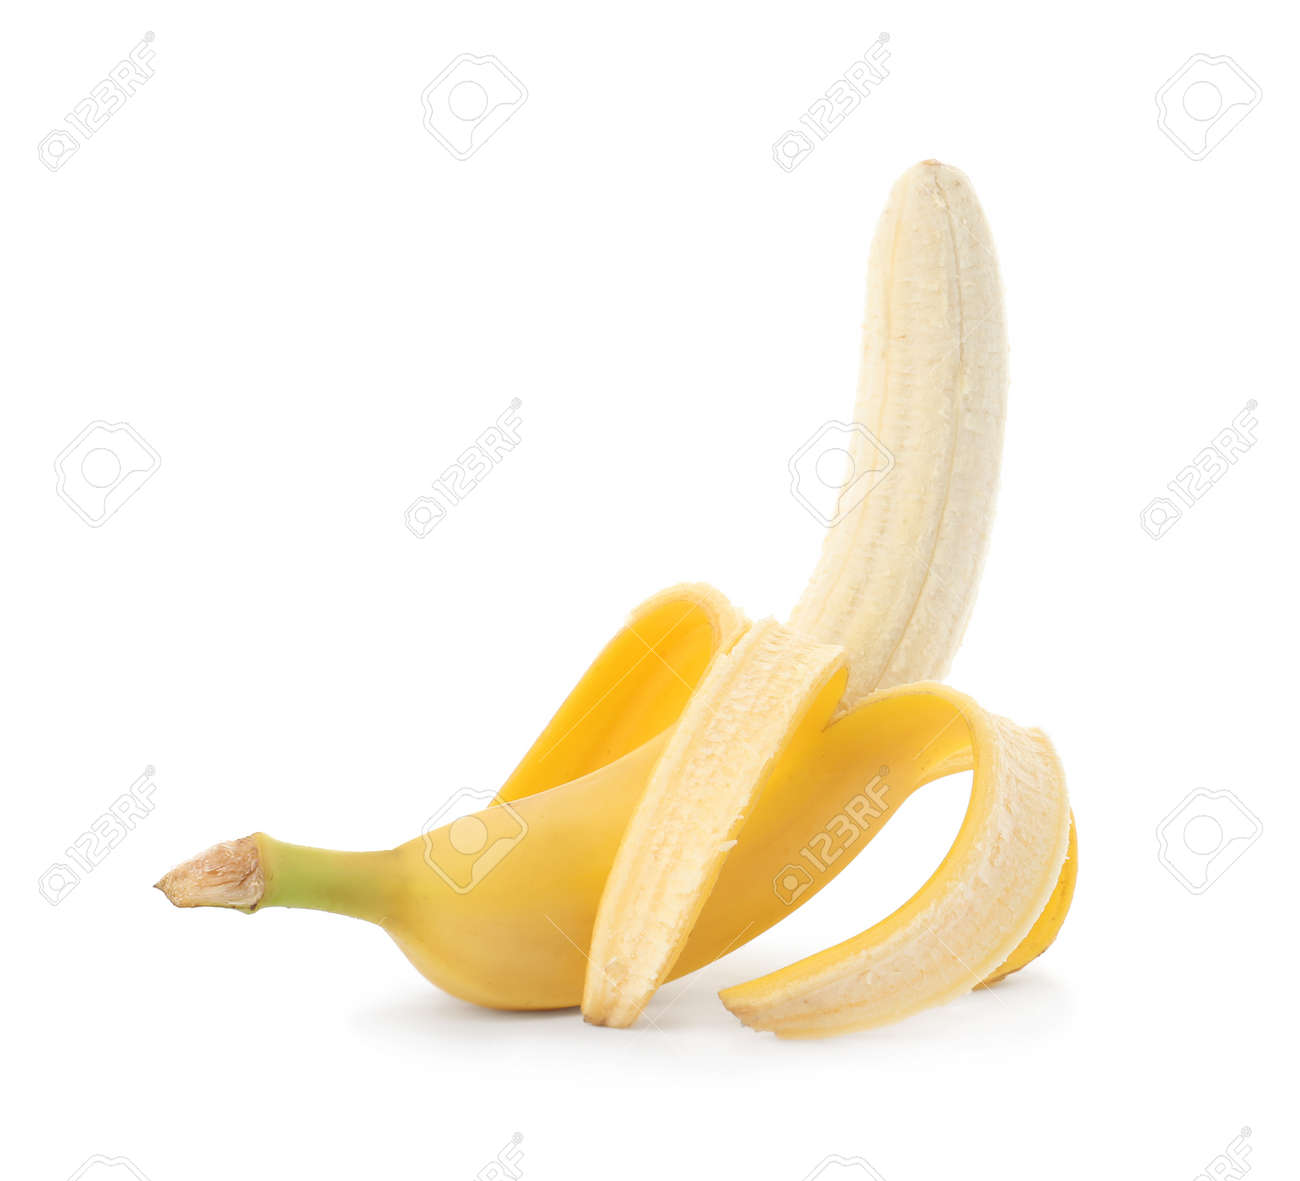 Peeled delicious ripe banana isolated on white - 149371135